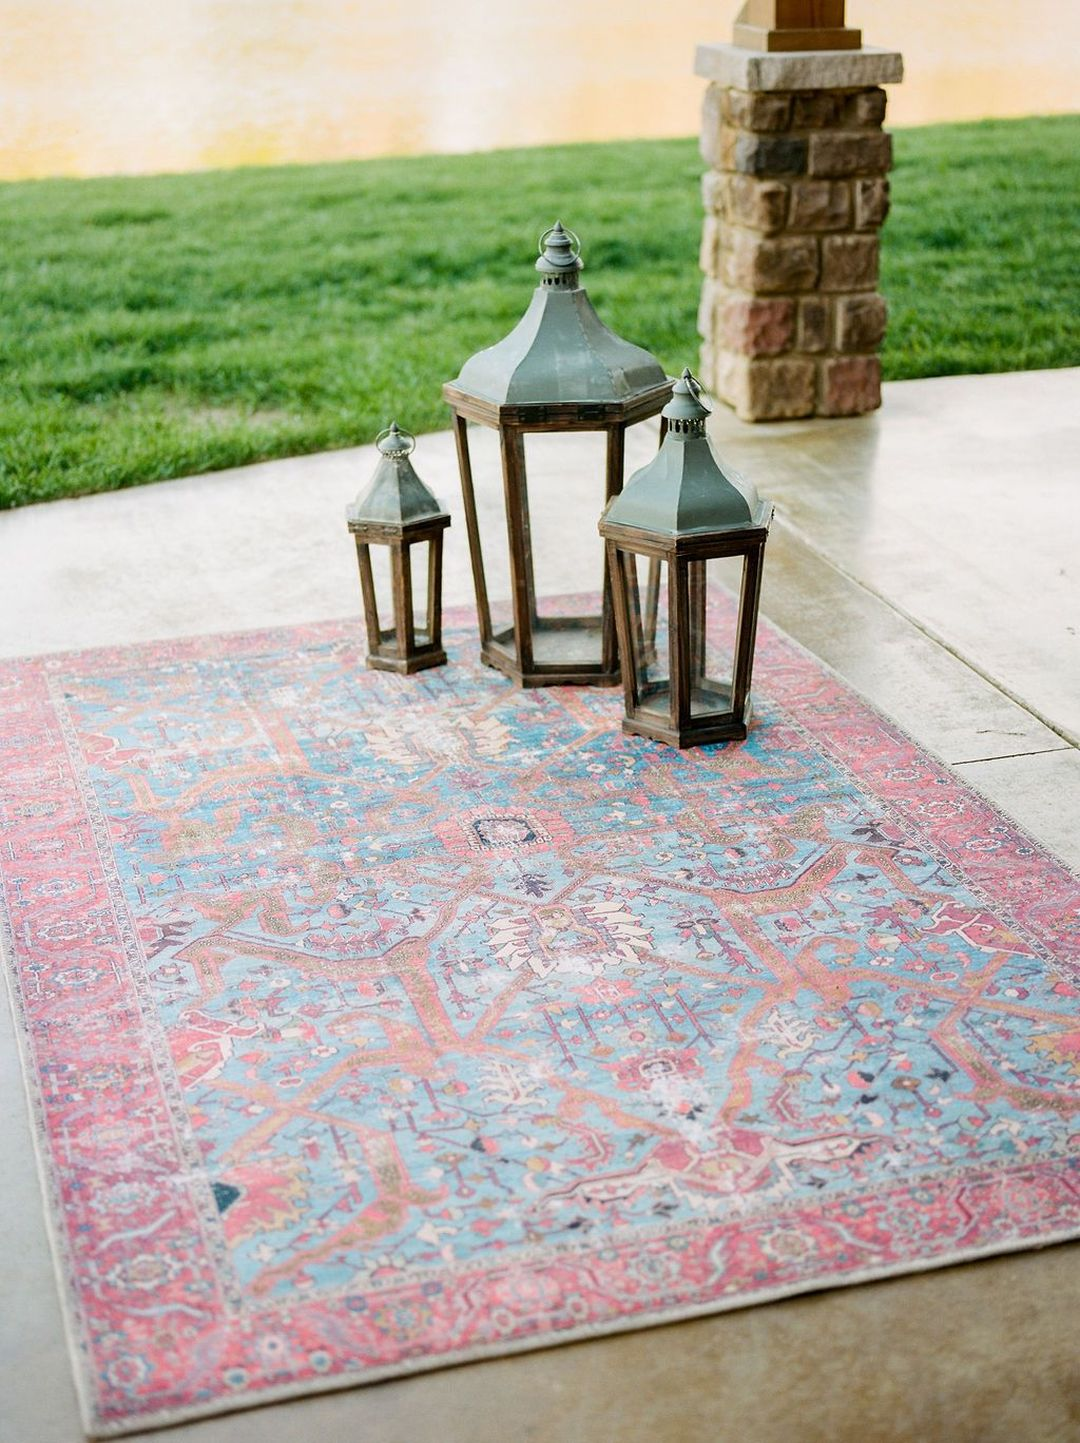 floor lanterns & red-blue rug